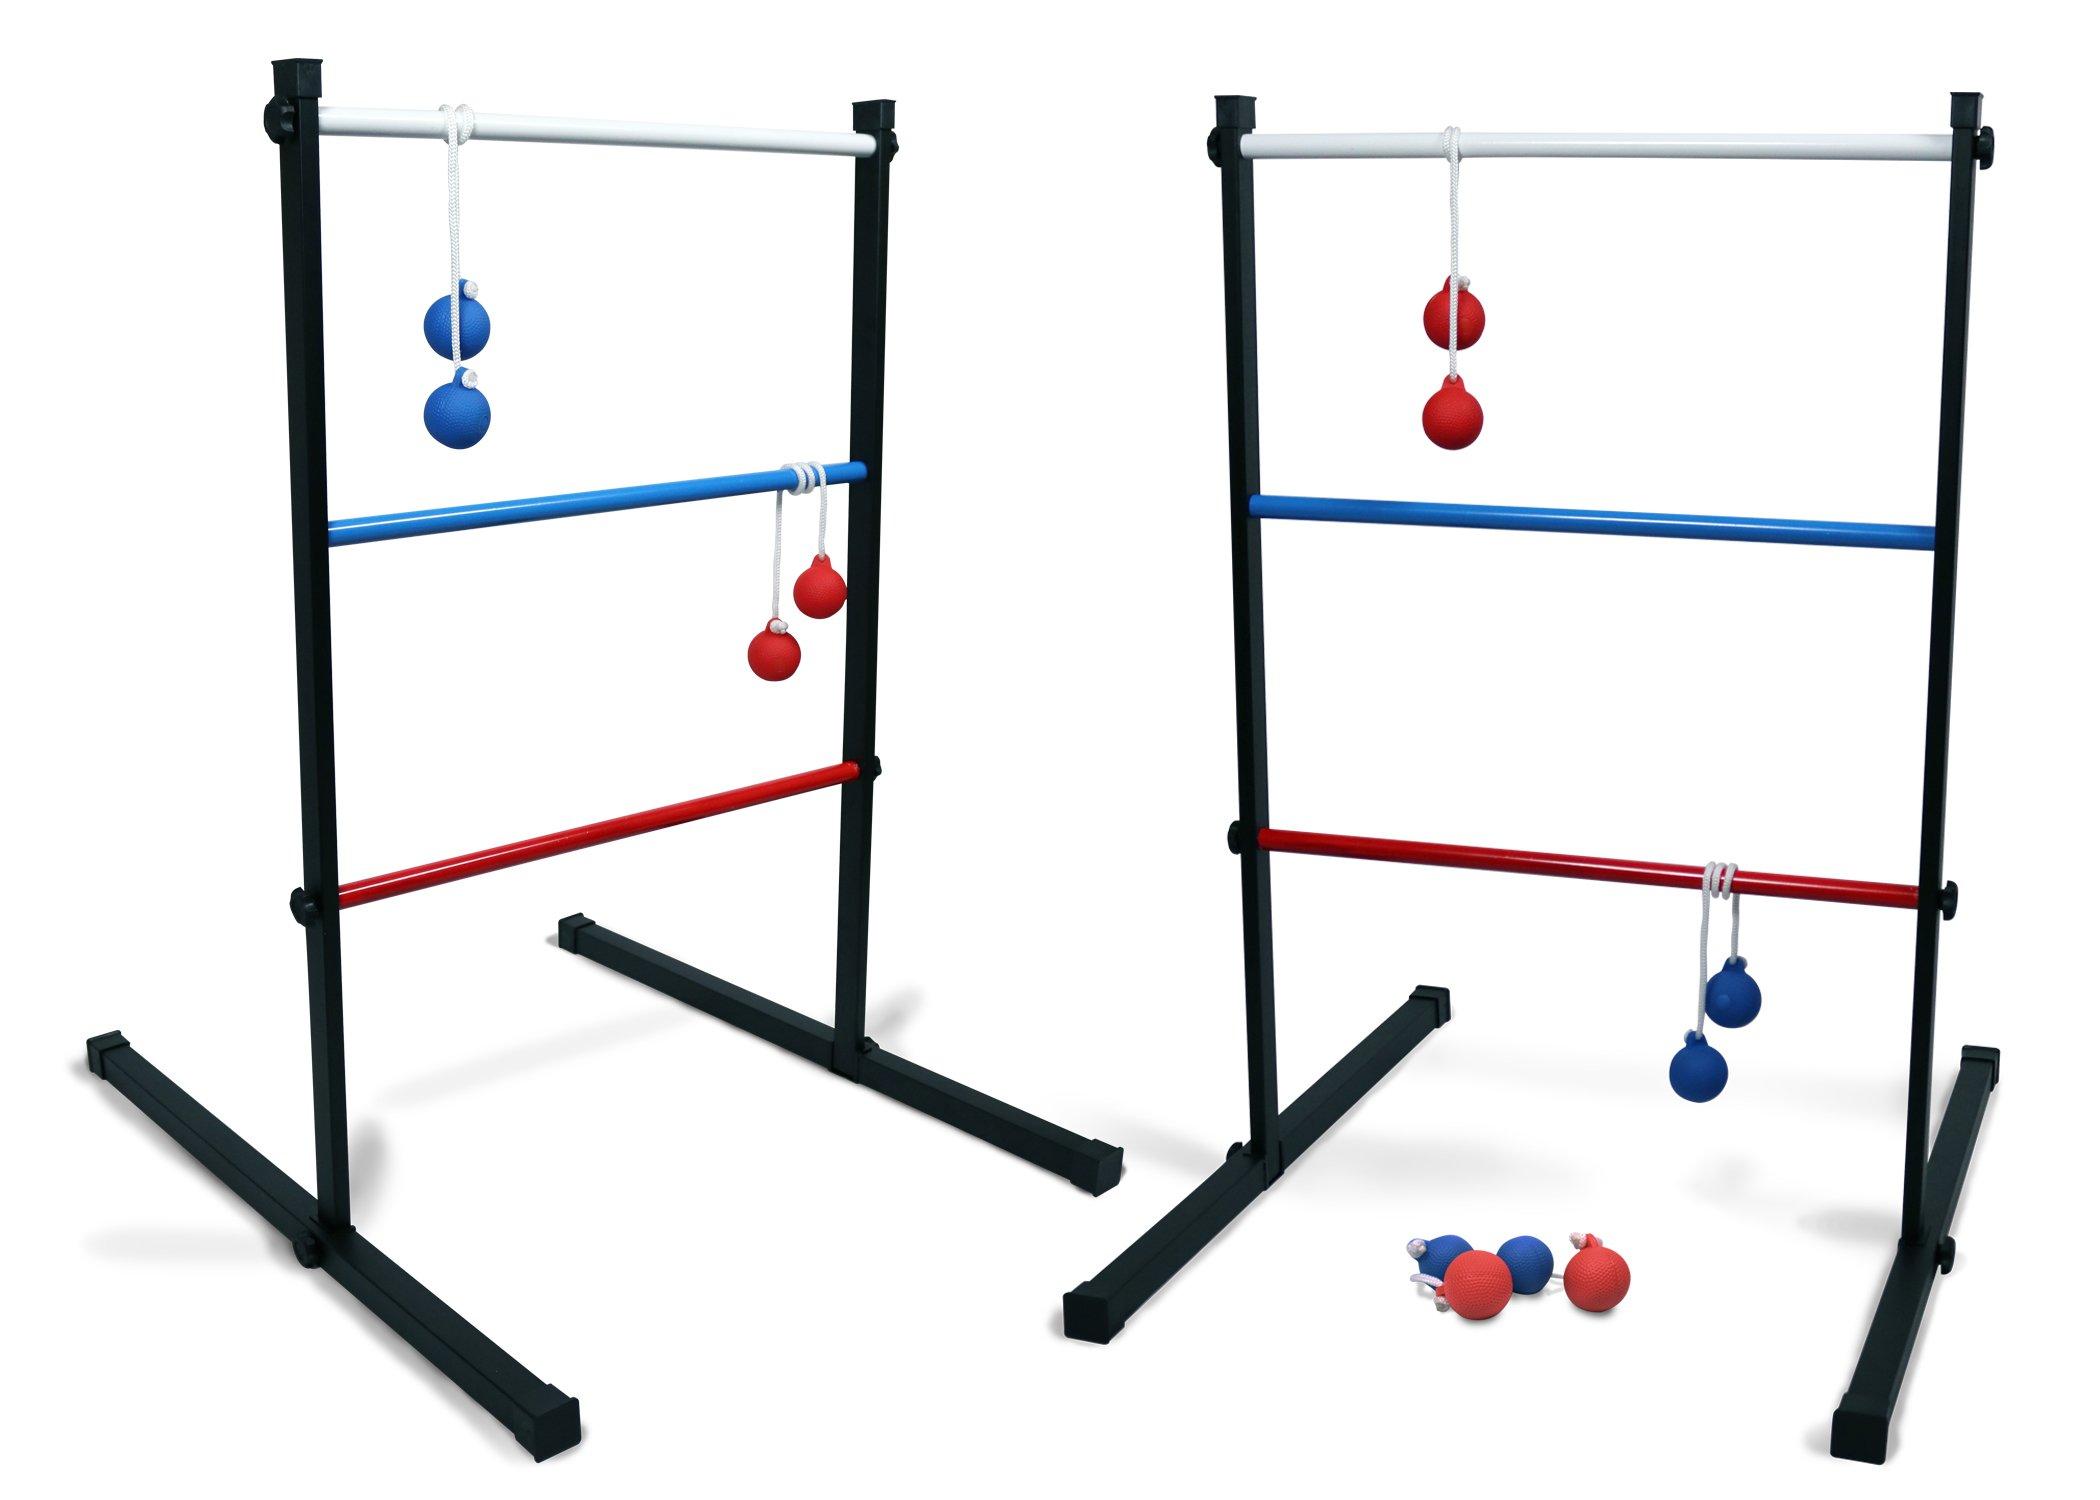 Backyard Champs LBMET-1 Metal Ladderball Game by Backyard Champs